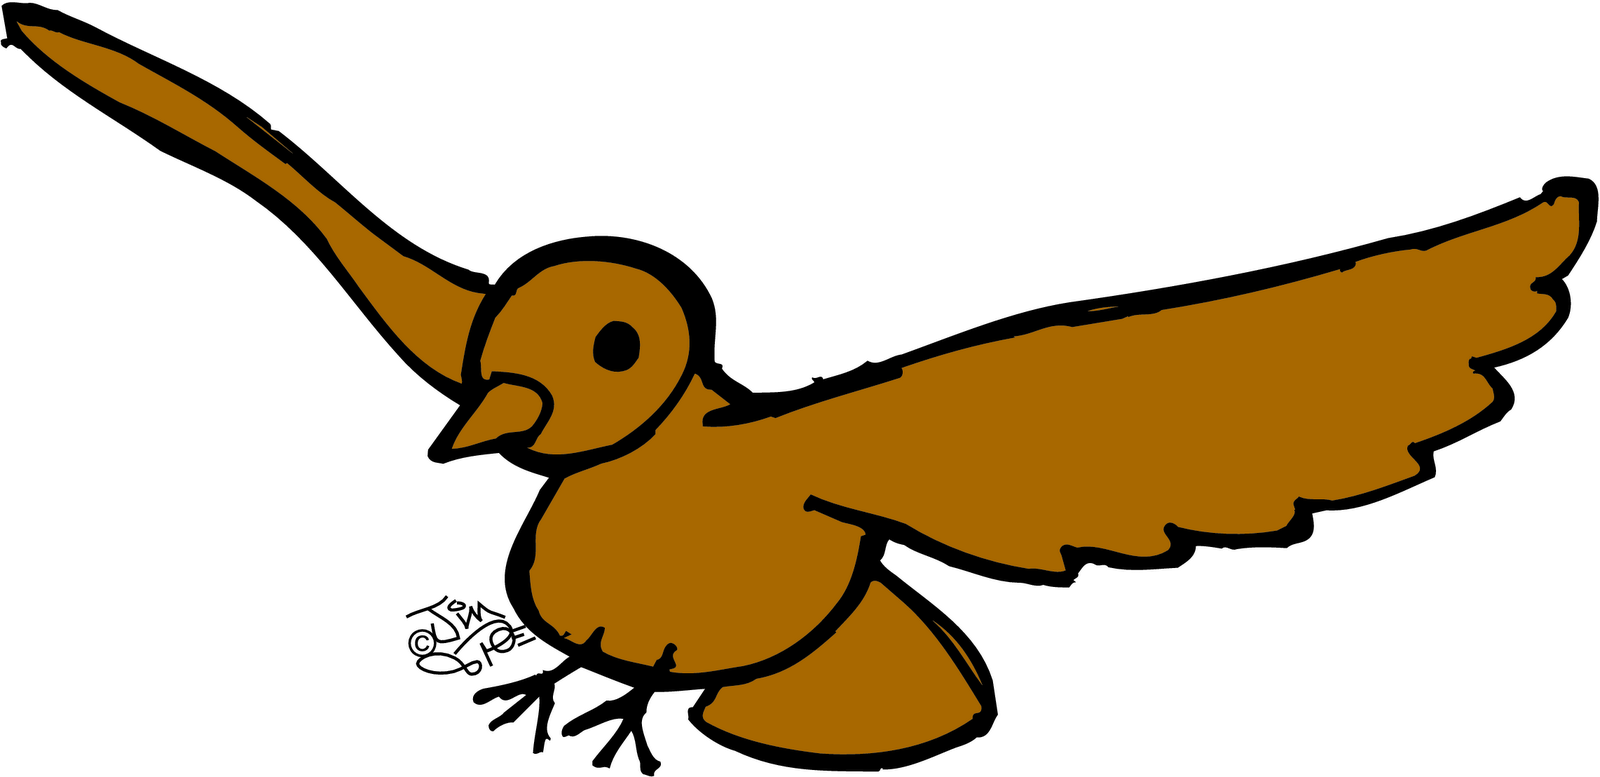 1600x777 Pretty Yellow Bird Clip Art The Graphics Fairy